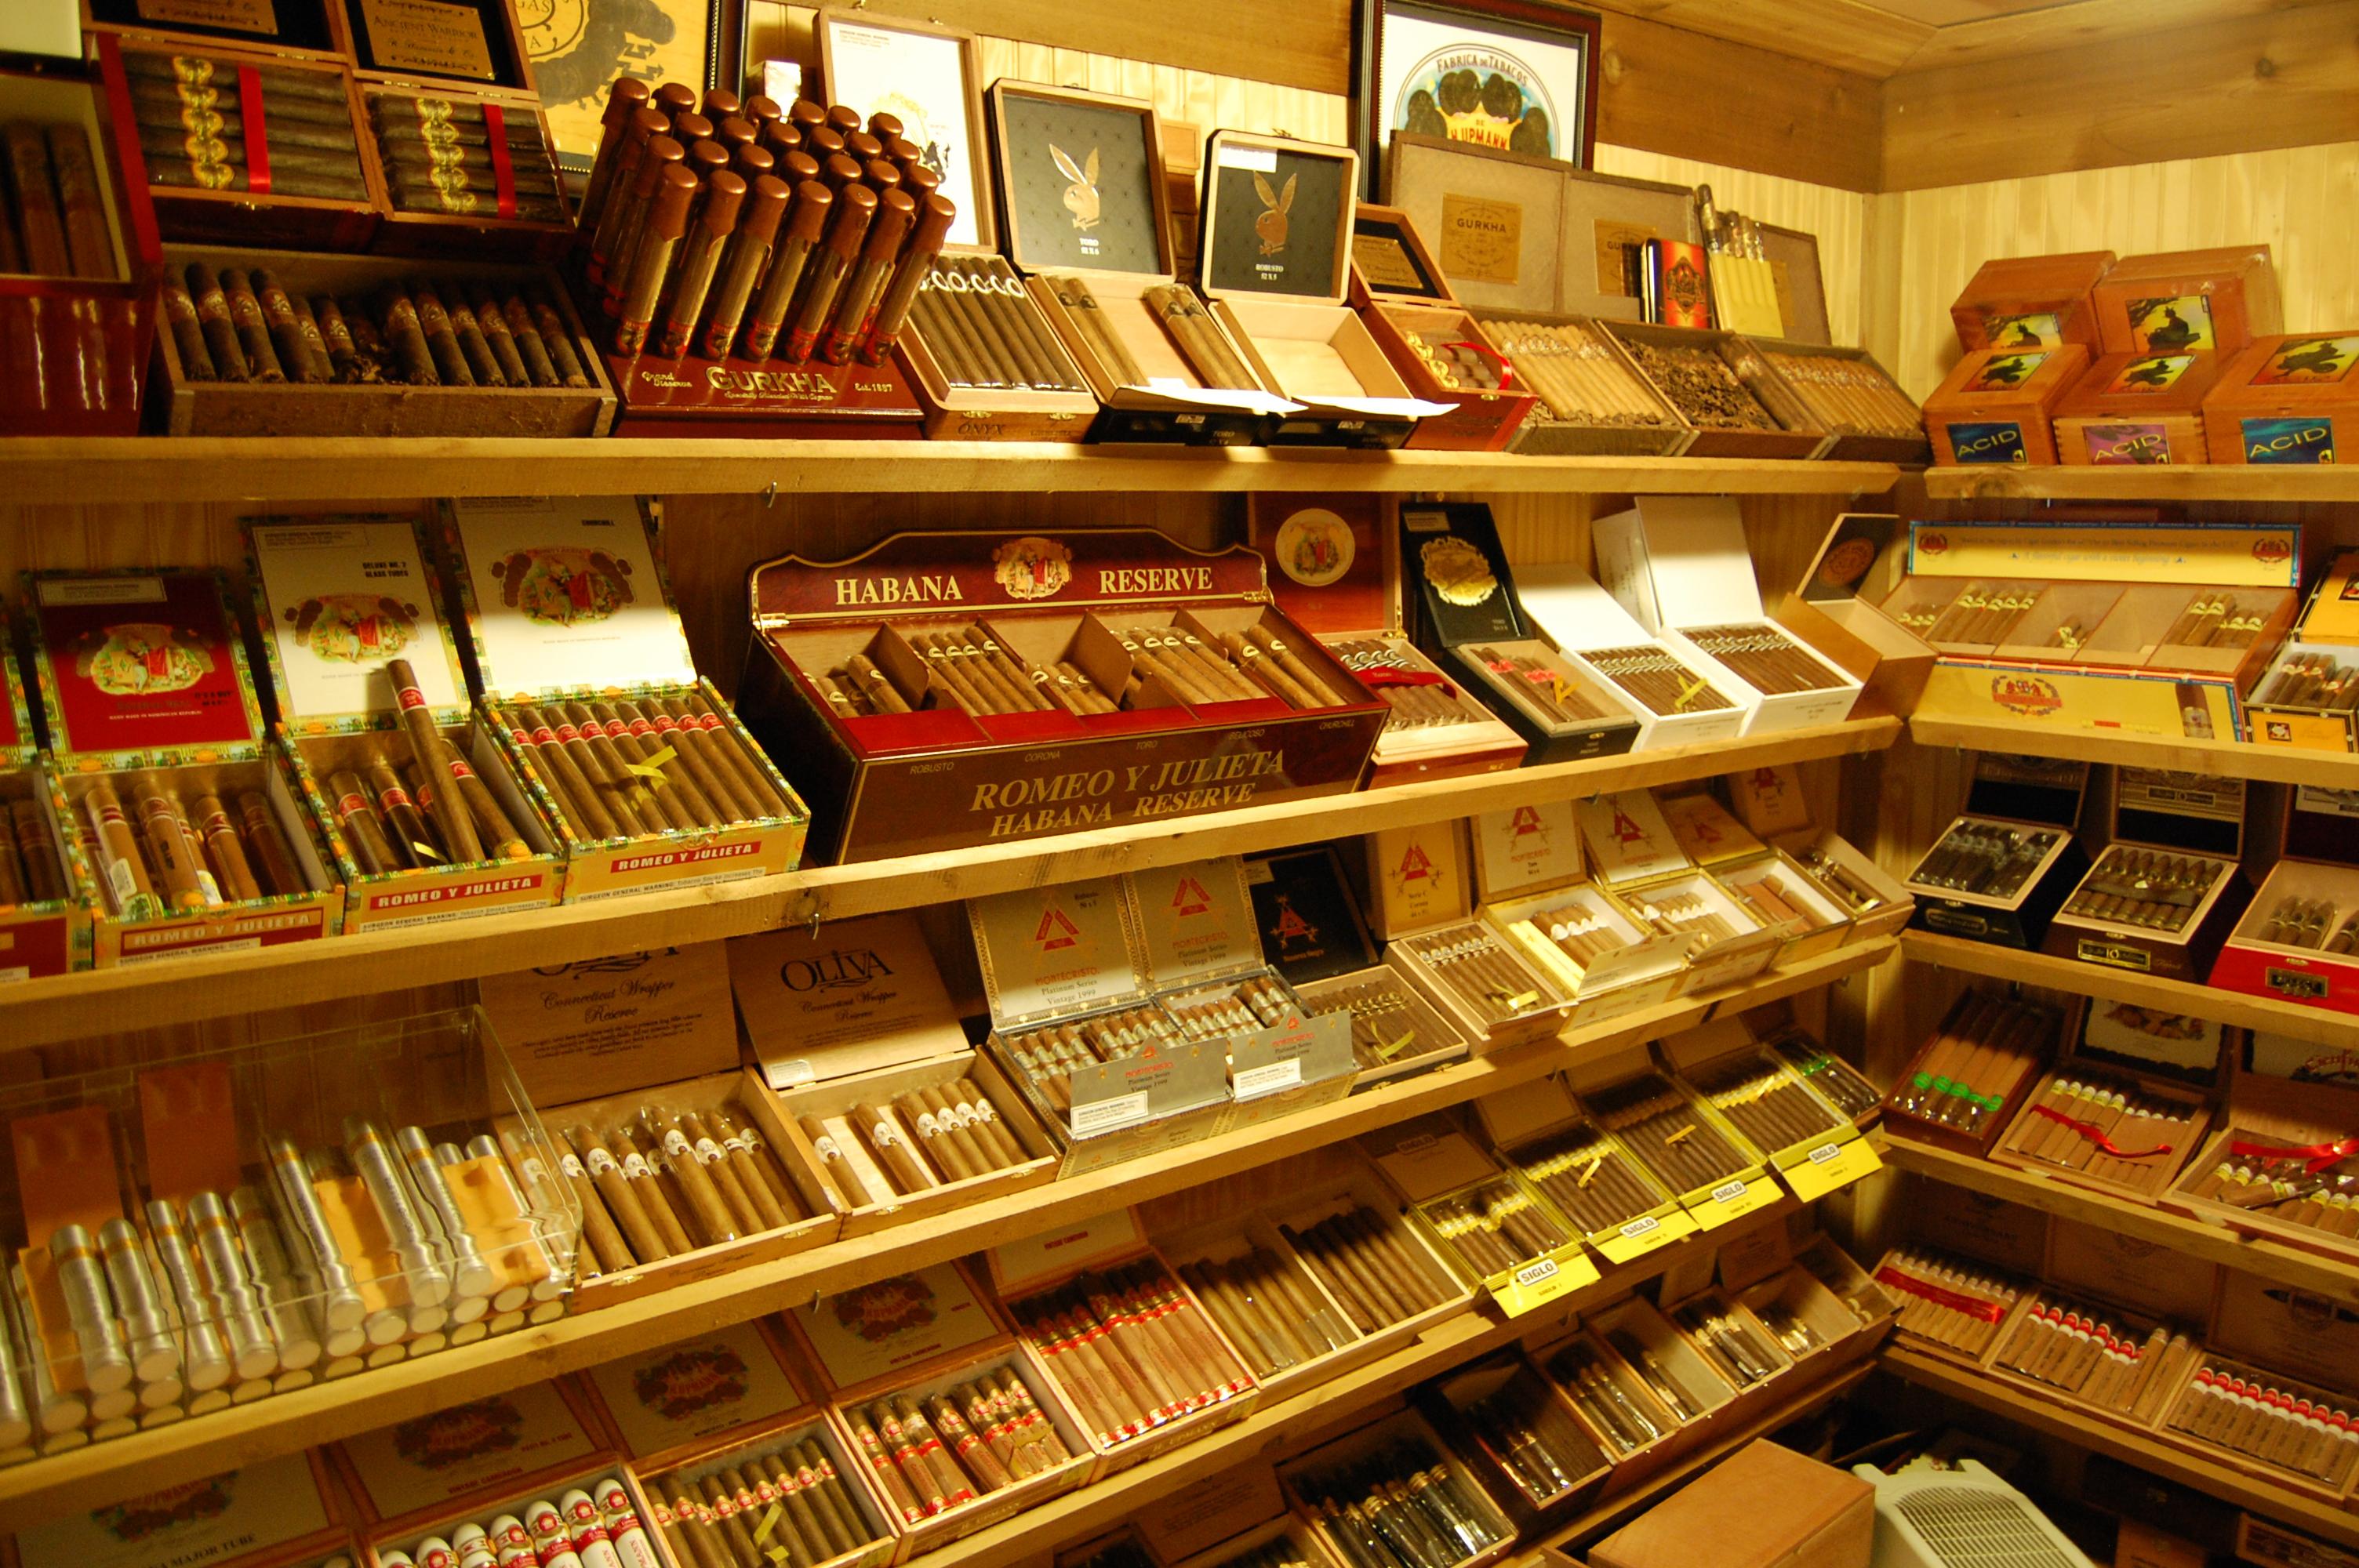 The Cigar Box OKC